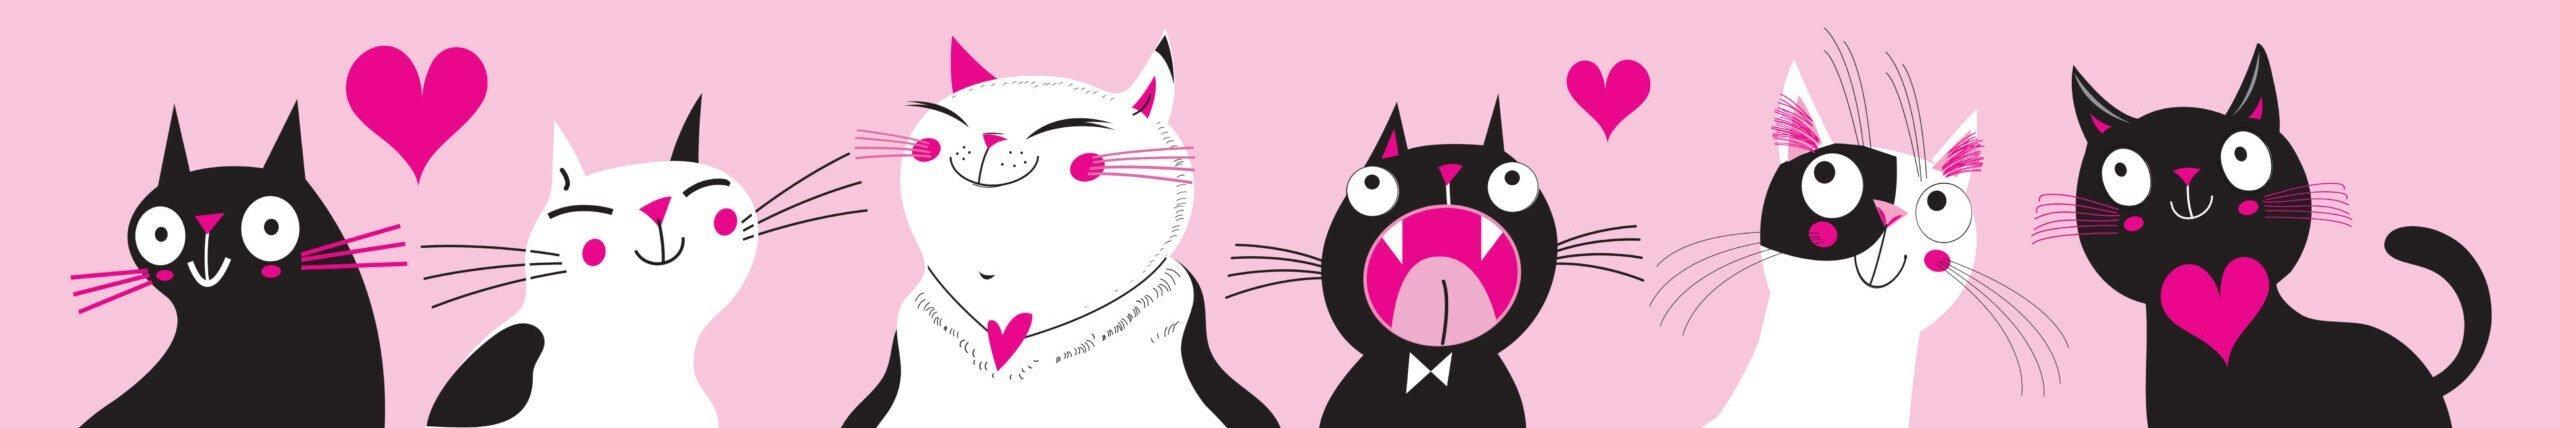 Kolorowanki koty